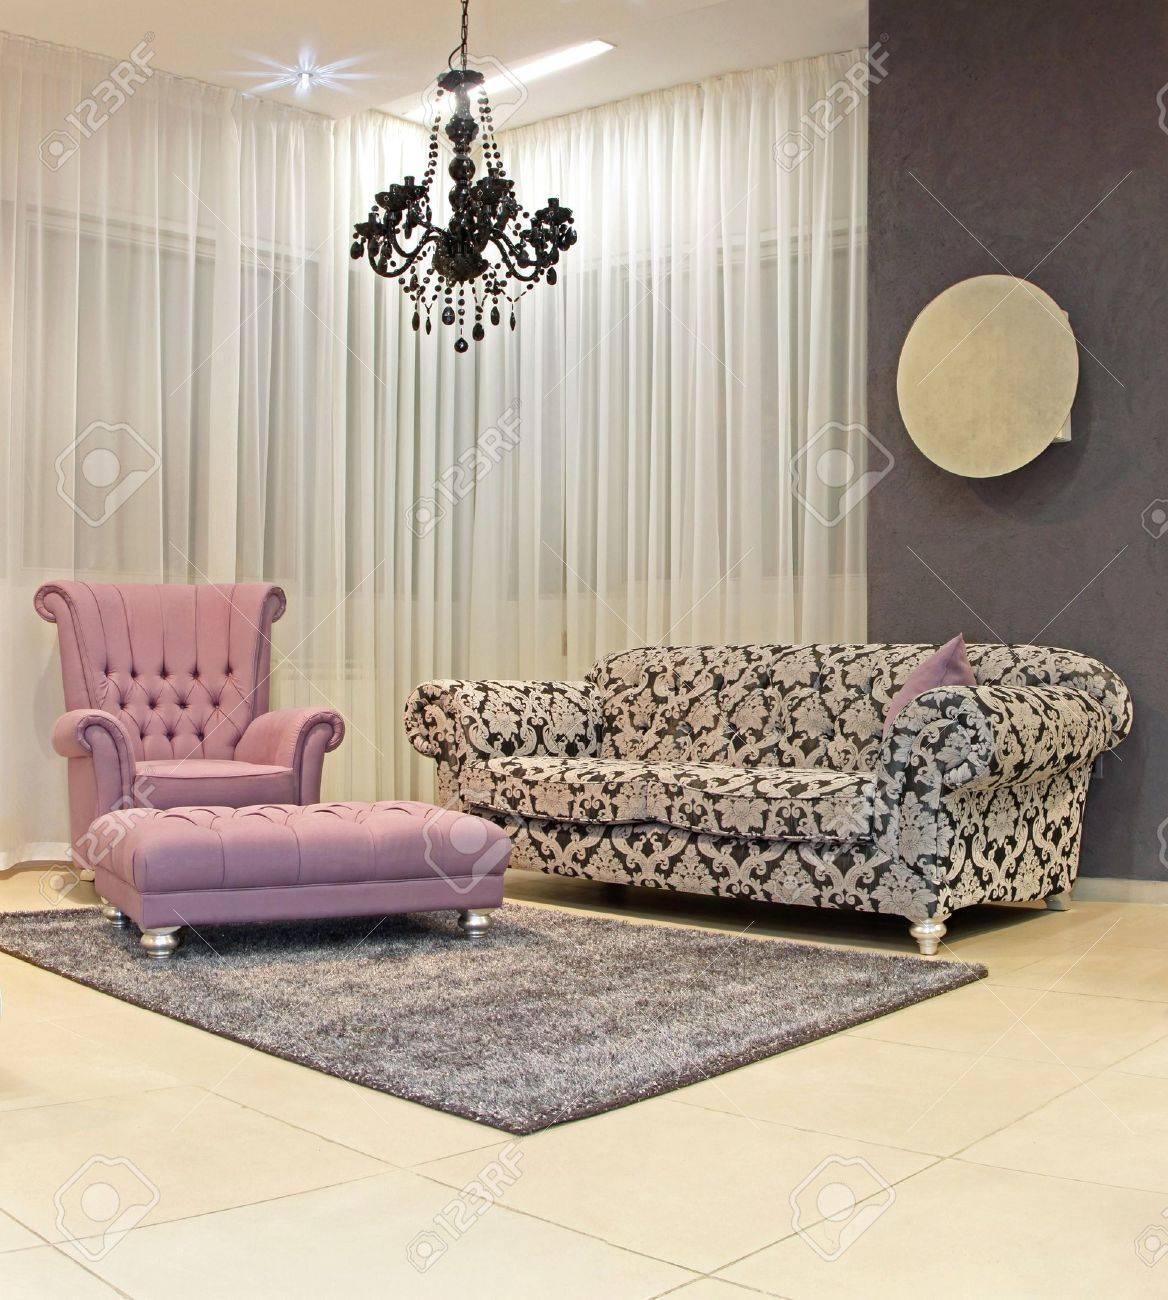 Modern Living Room Corner With Vintage Furniture Stock Photo